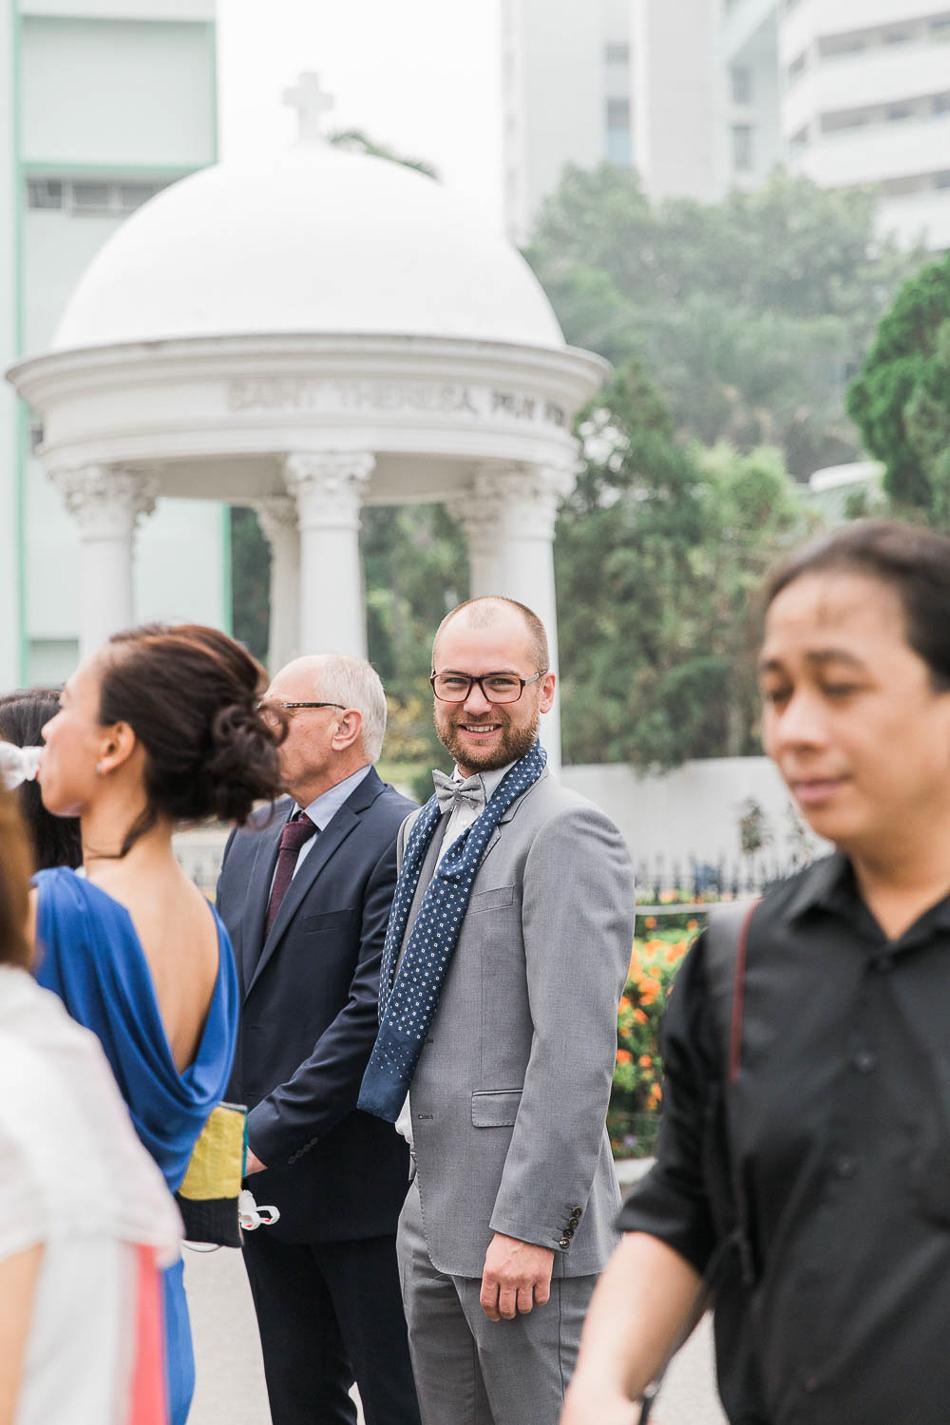 wedding-photographer-singapore-film-photographer-chen-sands-Anglea-wedding-CSPBLOG-3.jpg